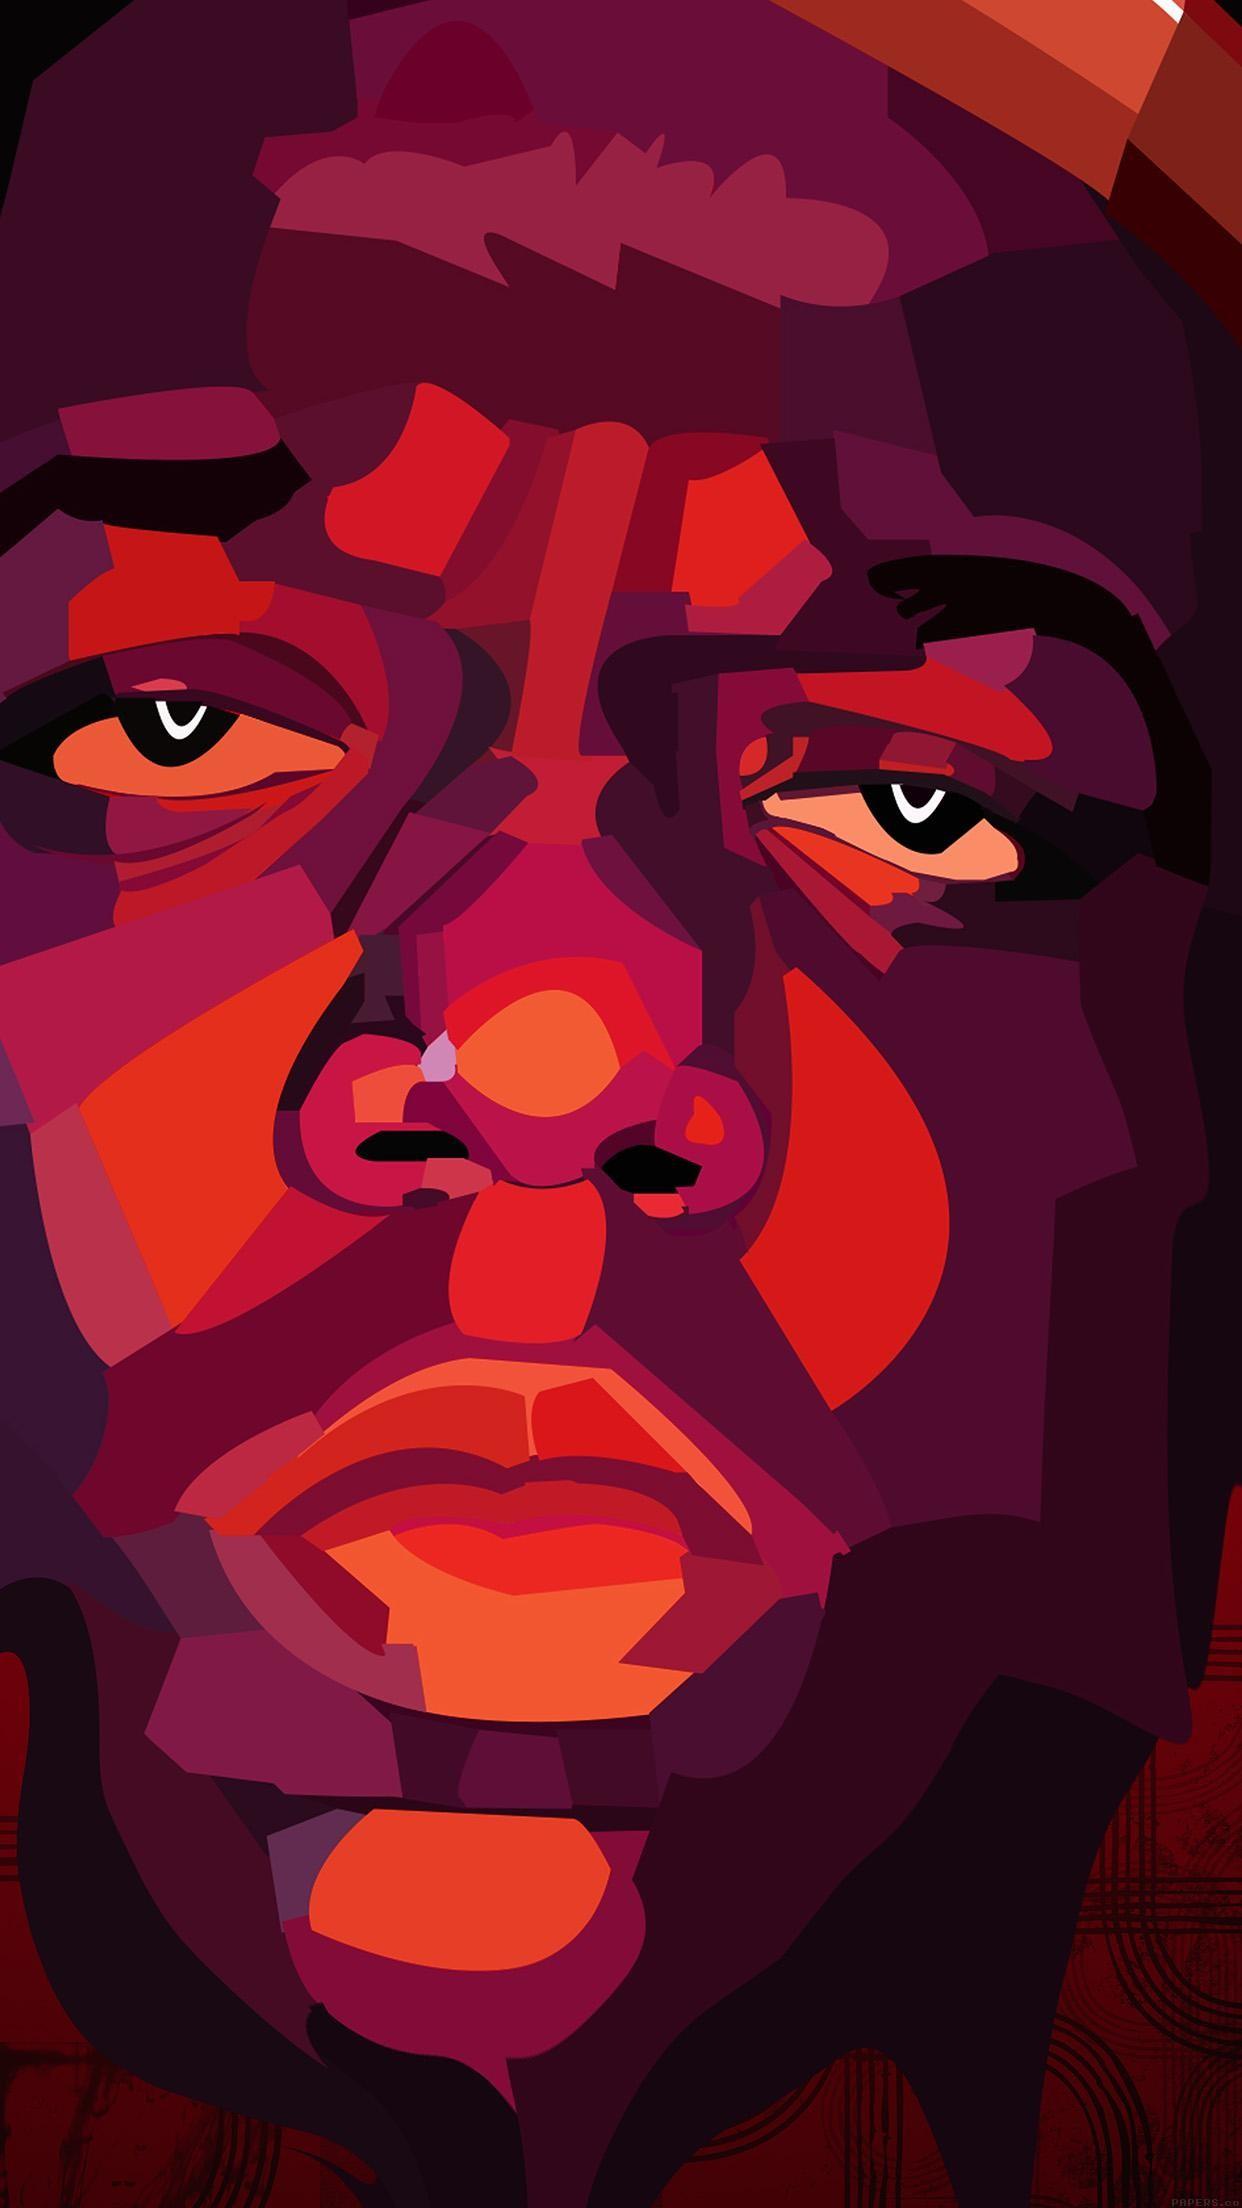 Biggie Smalls Notorious Big Rapper Music